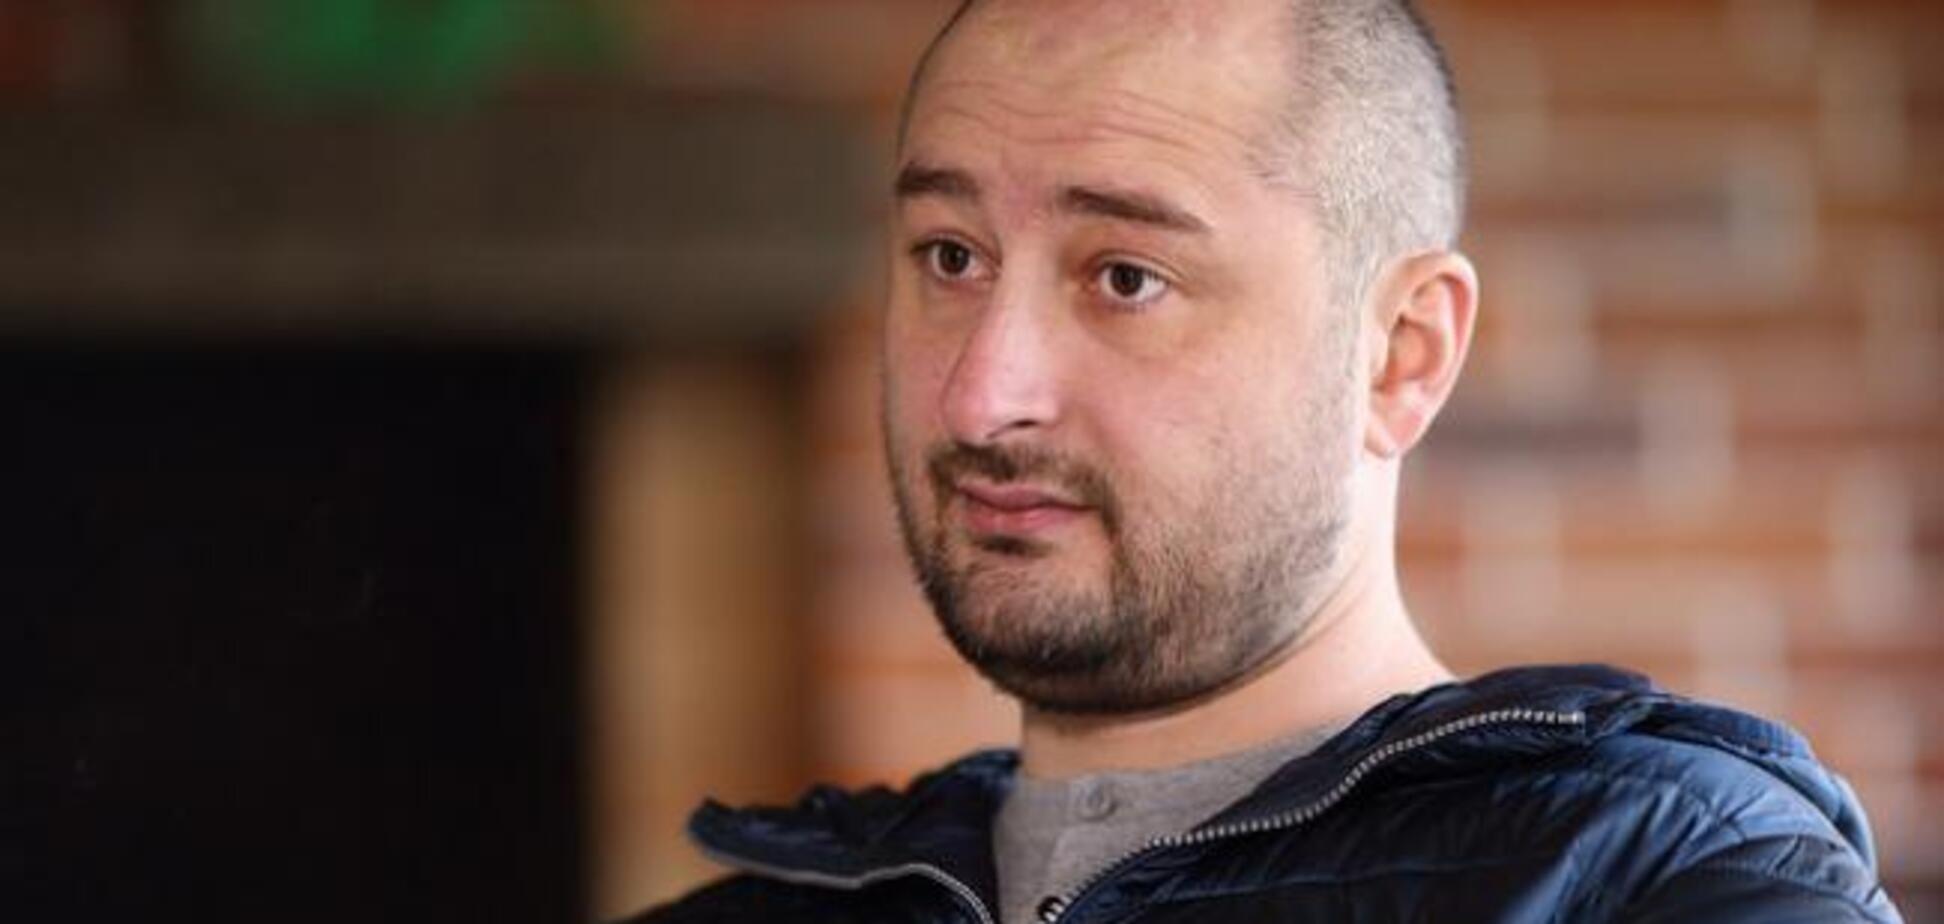 Бабченко знав свого вбивцю особисто - Лойко